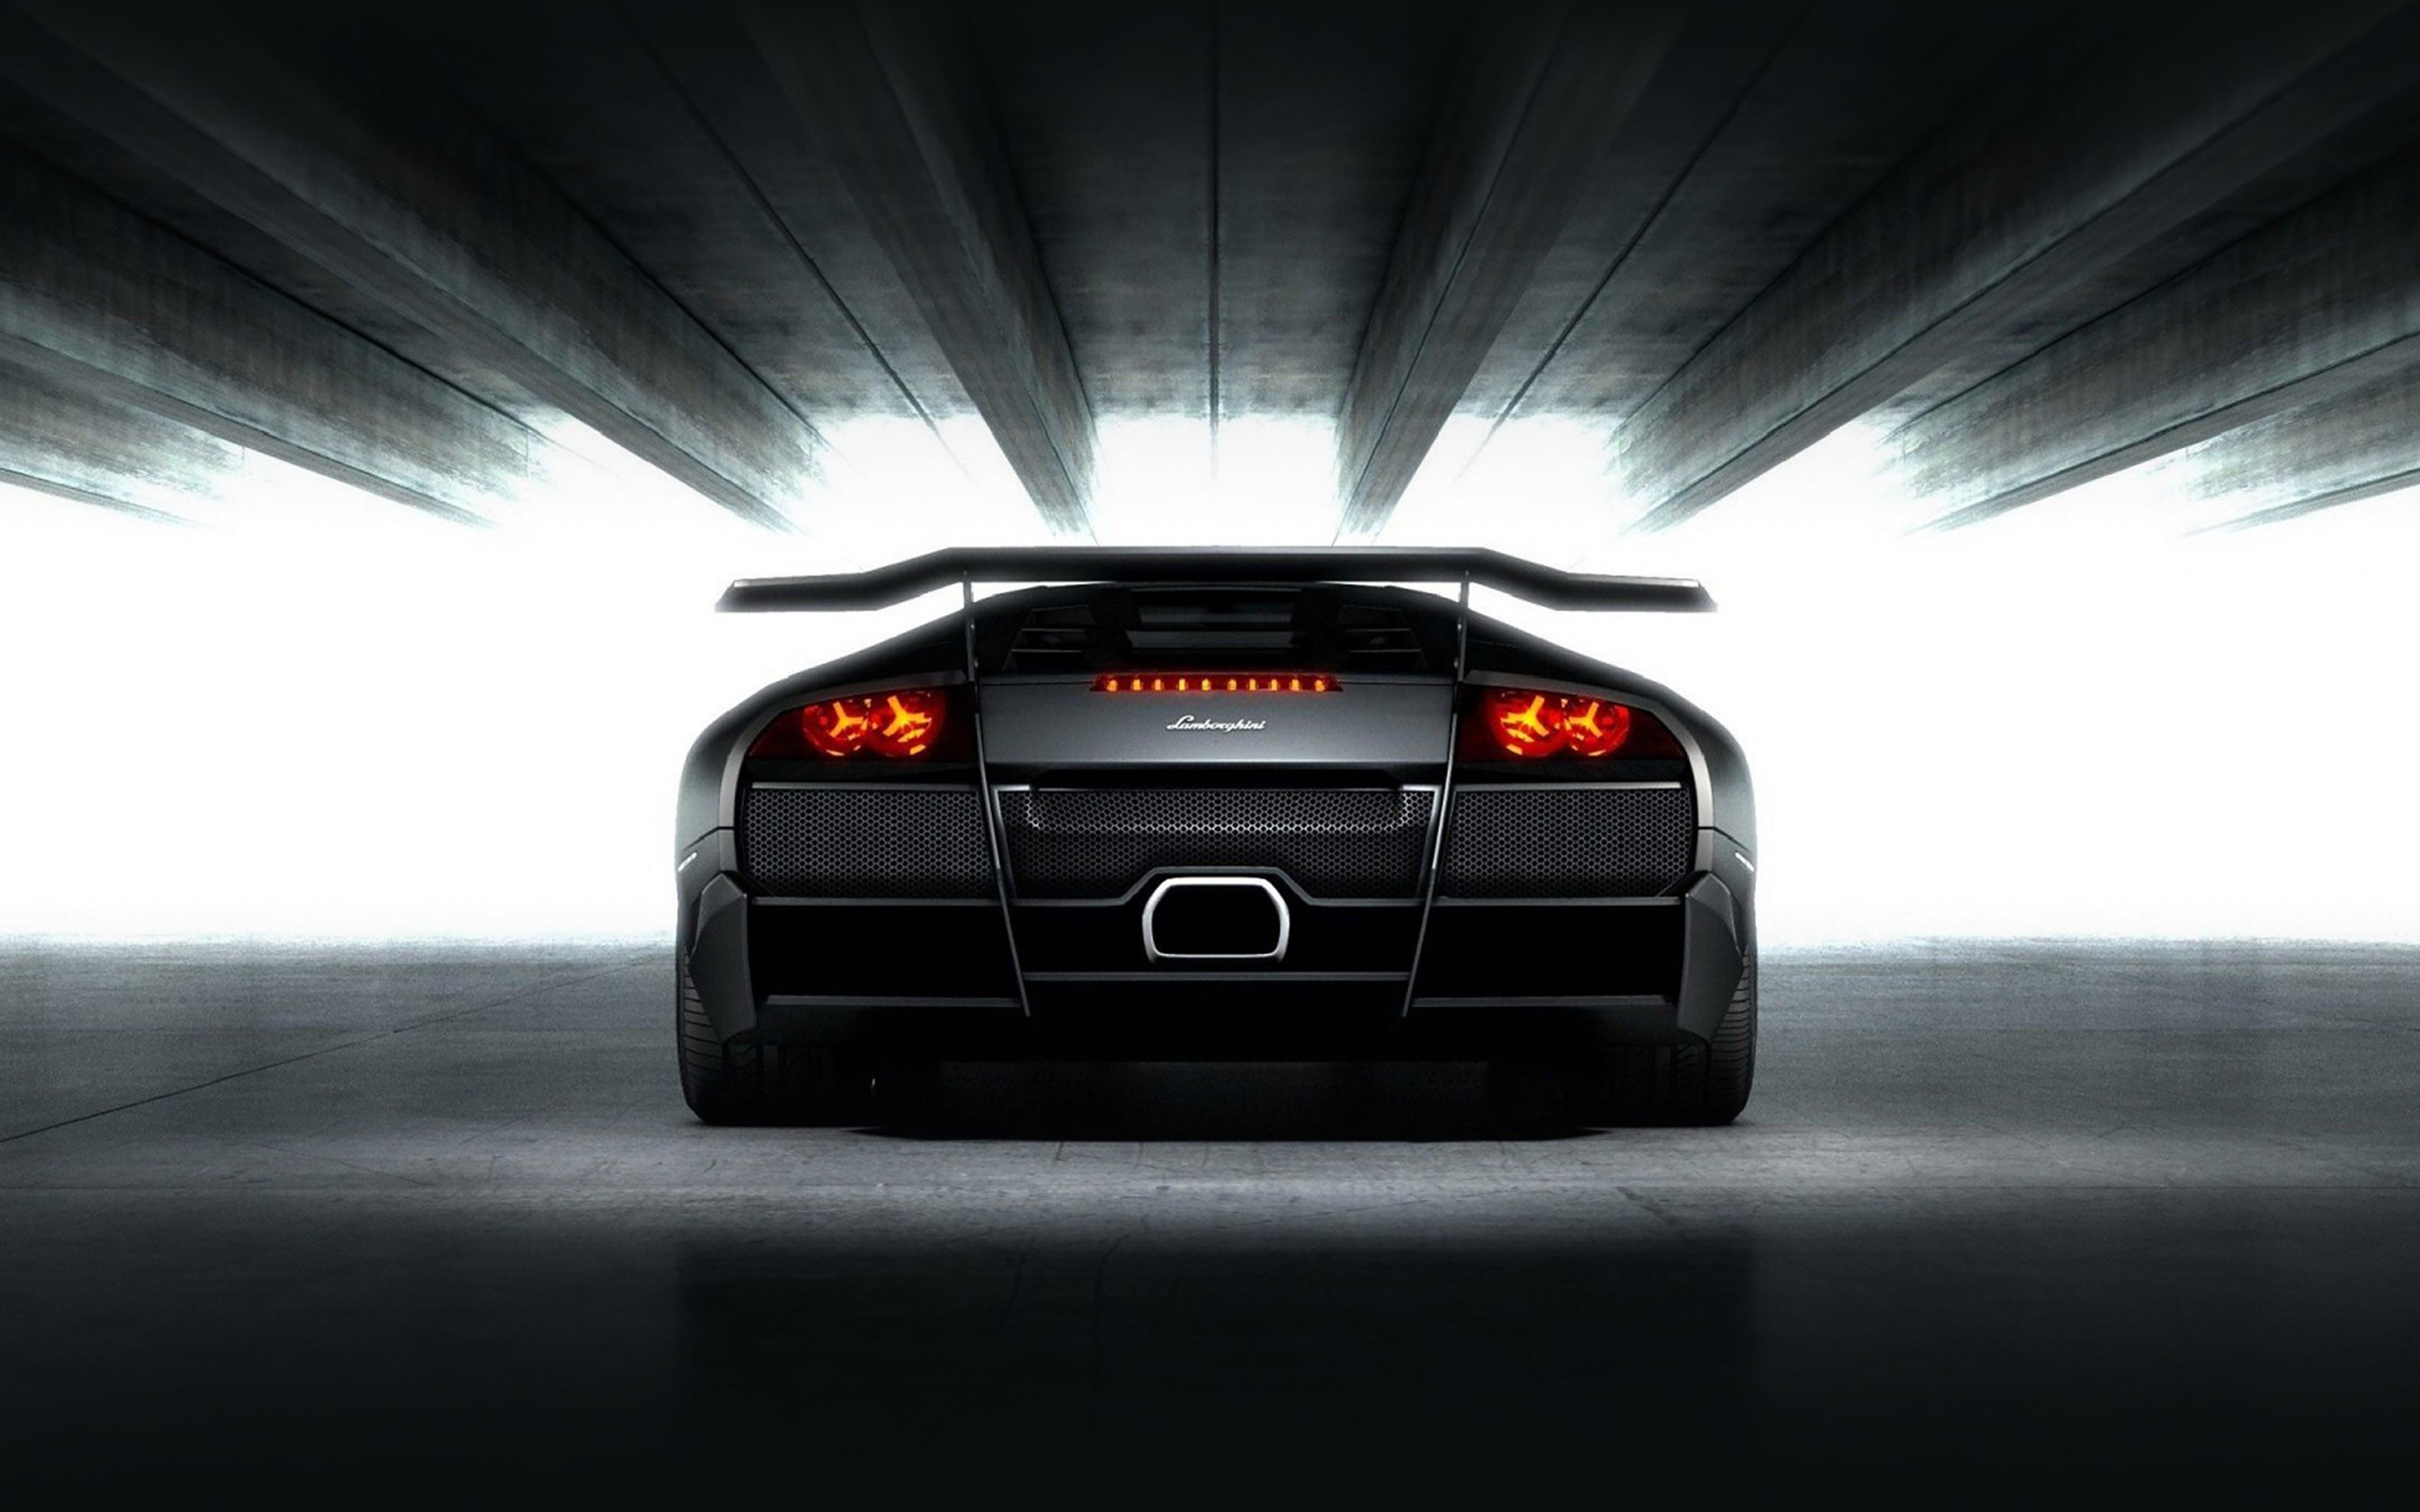 Me64 Lamborghini In My Garage Car Papers Co